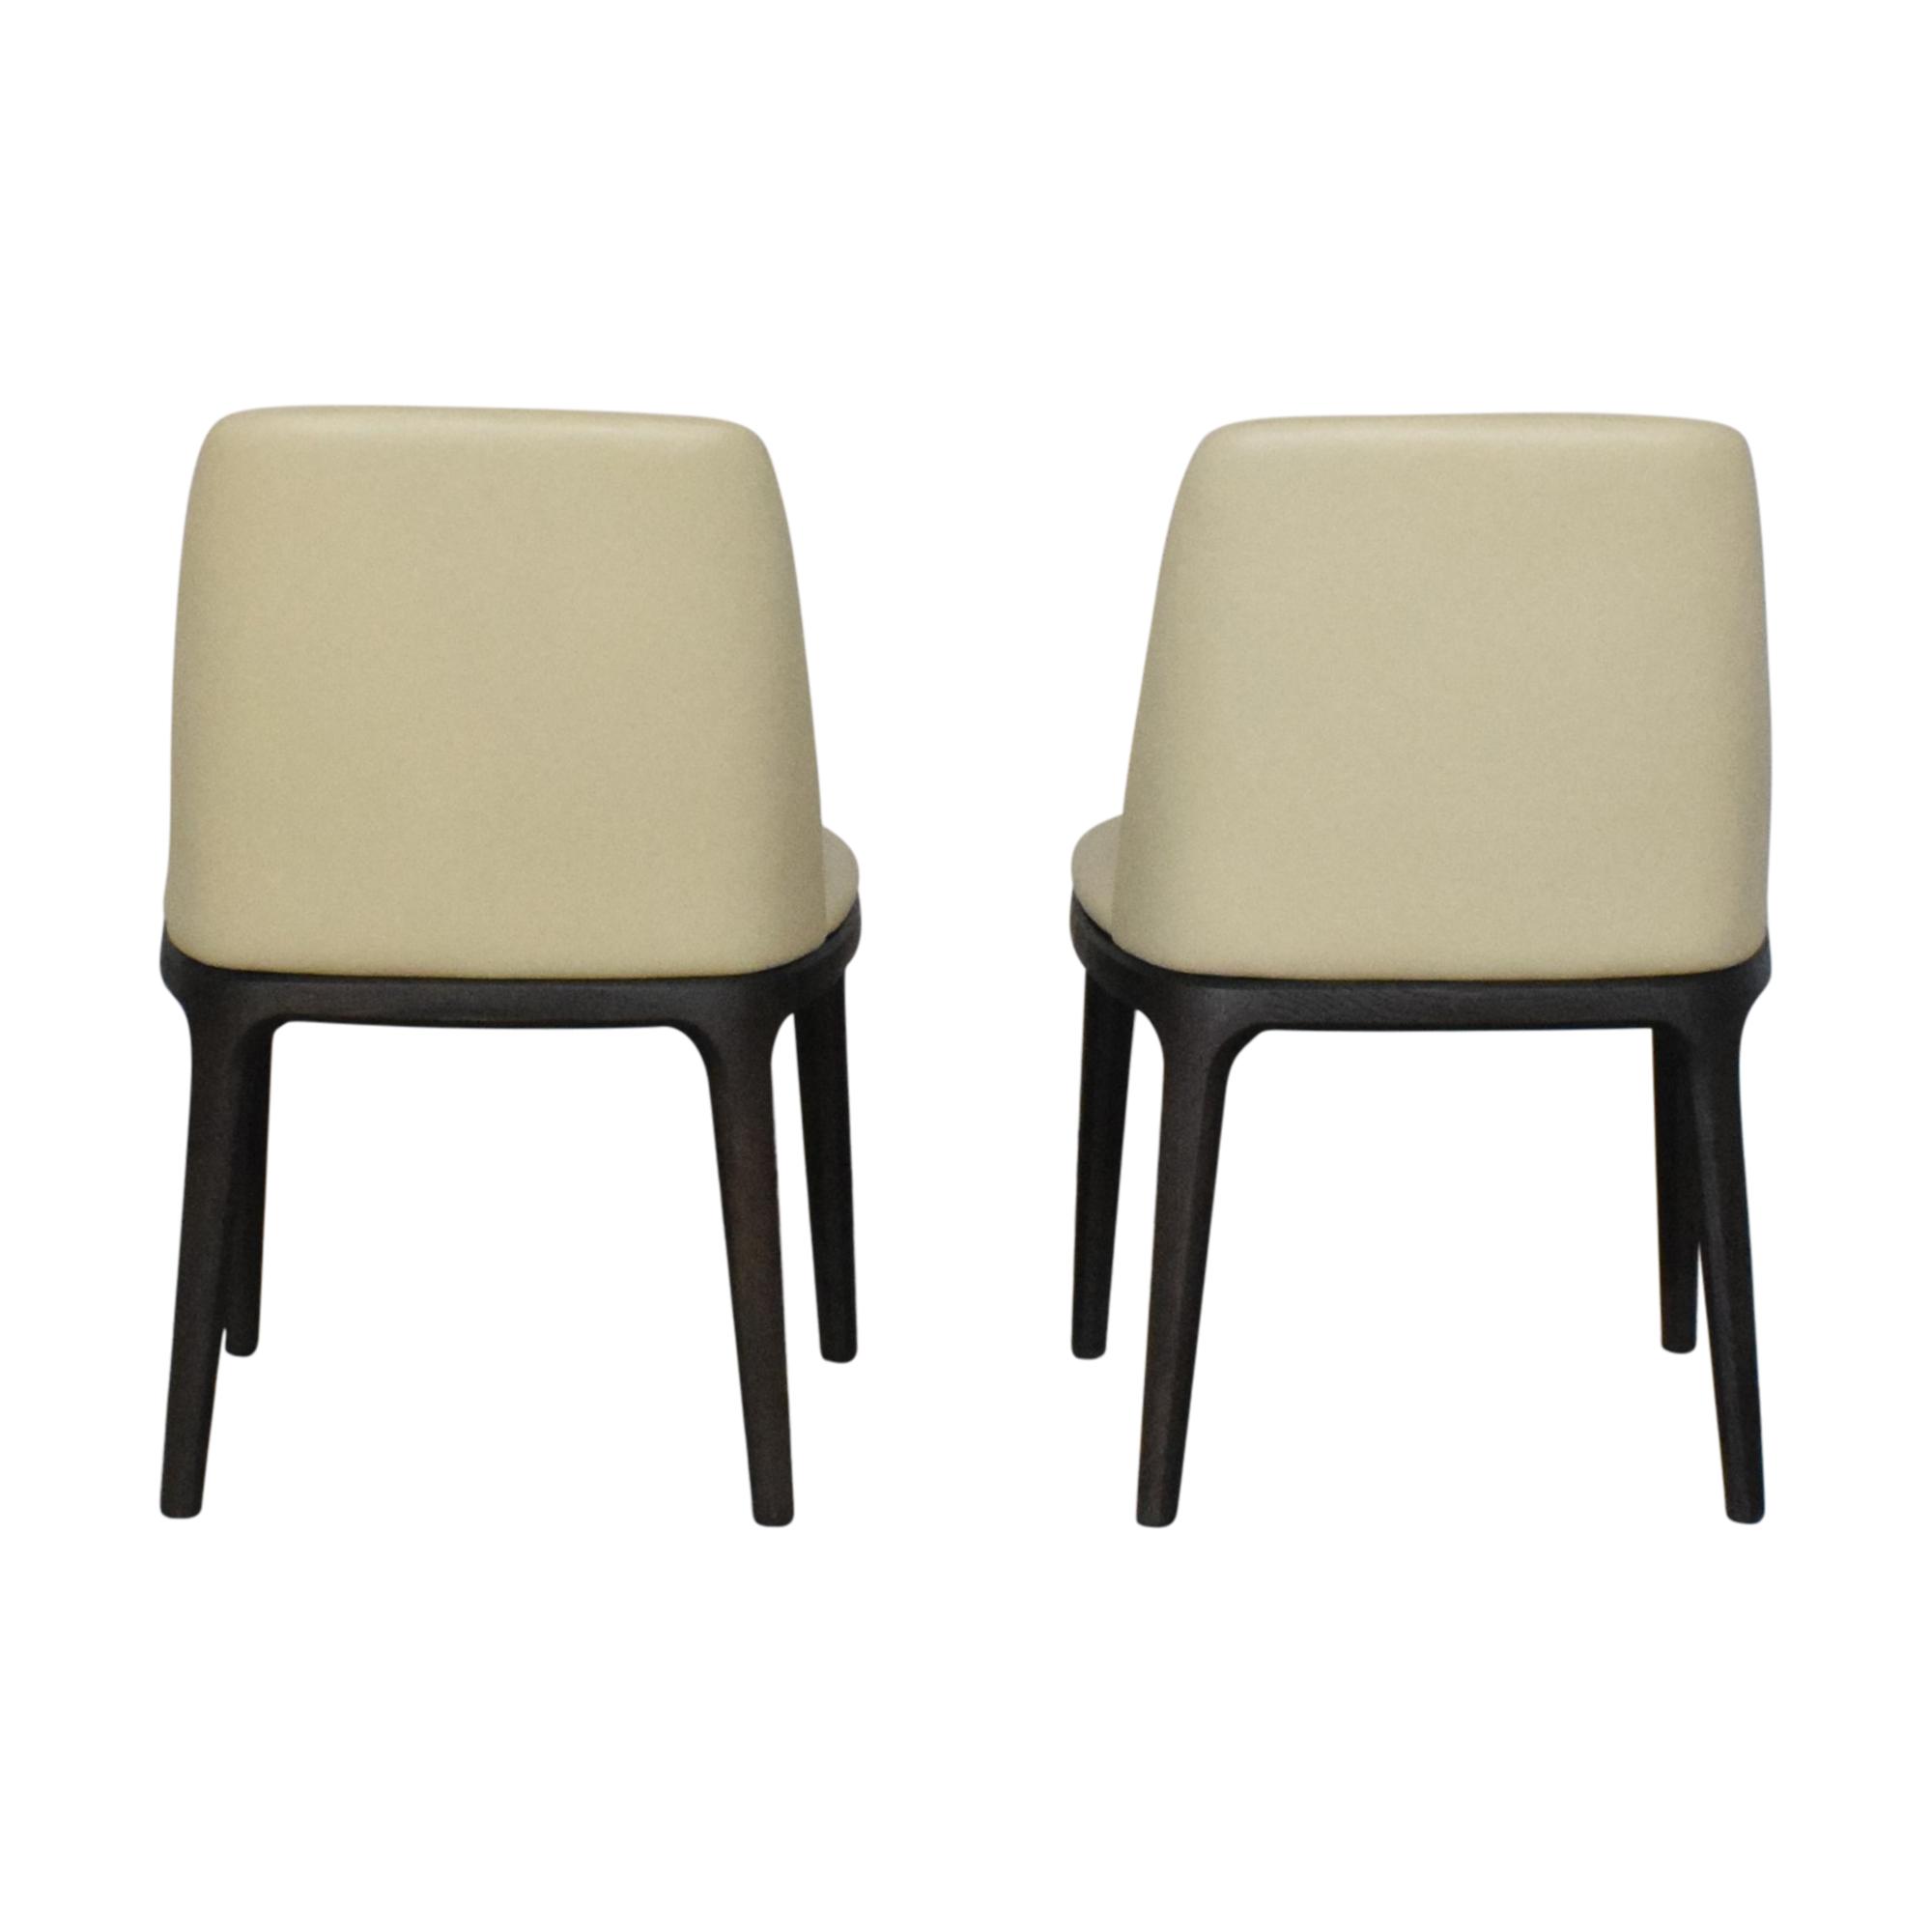 shop Poliform Grace Chairs Poliform Dining Chairs